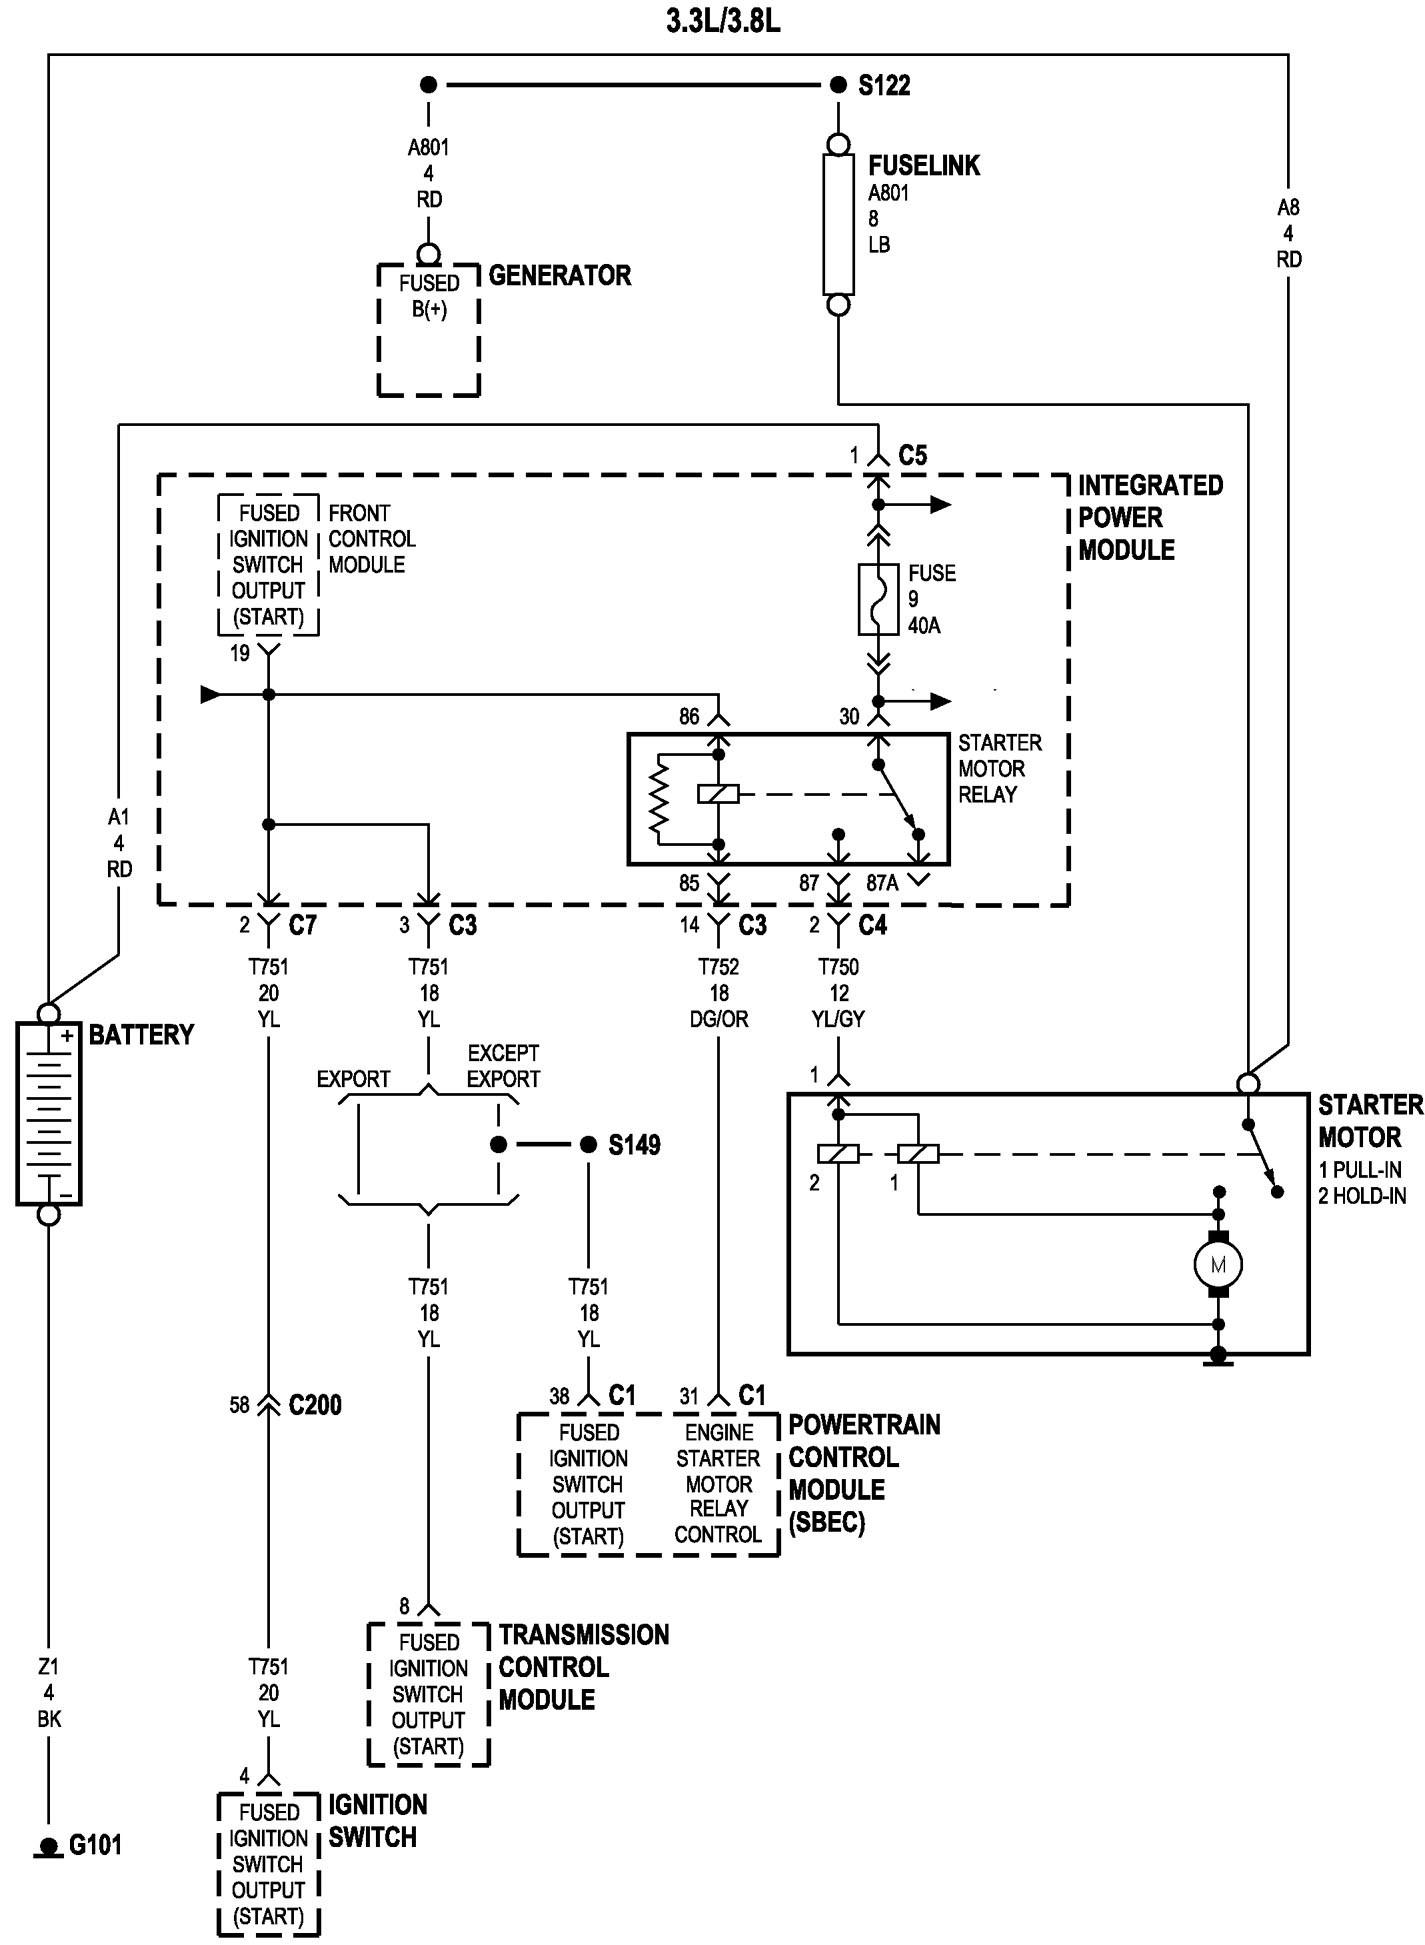 hight resolution of 2006 dodge grand caravan engine diagram beautiful 2002 dodge caravan wiring diagram ideas everything you of